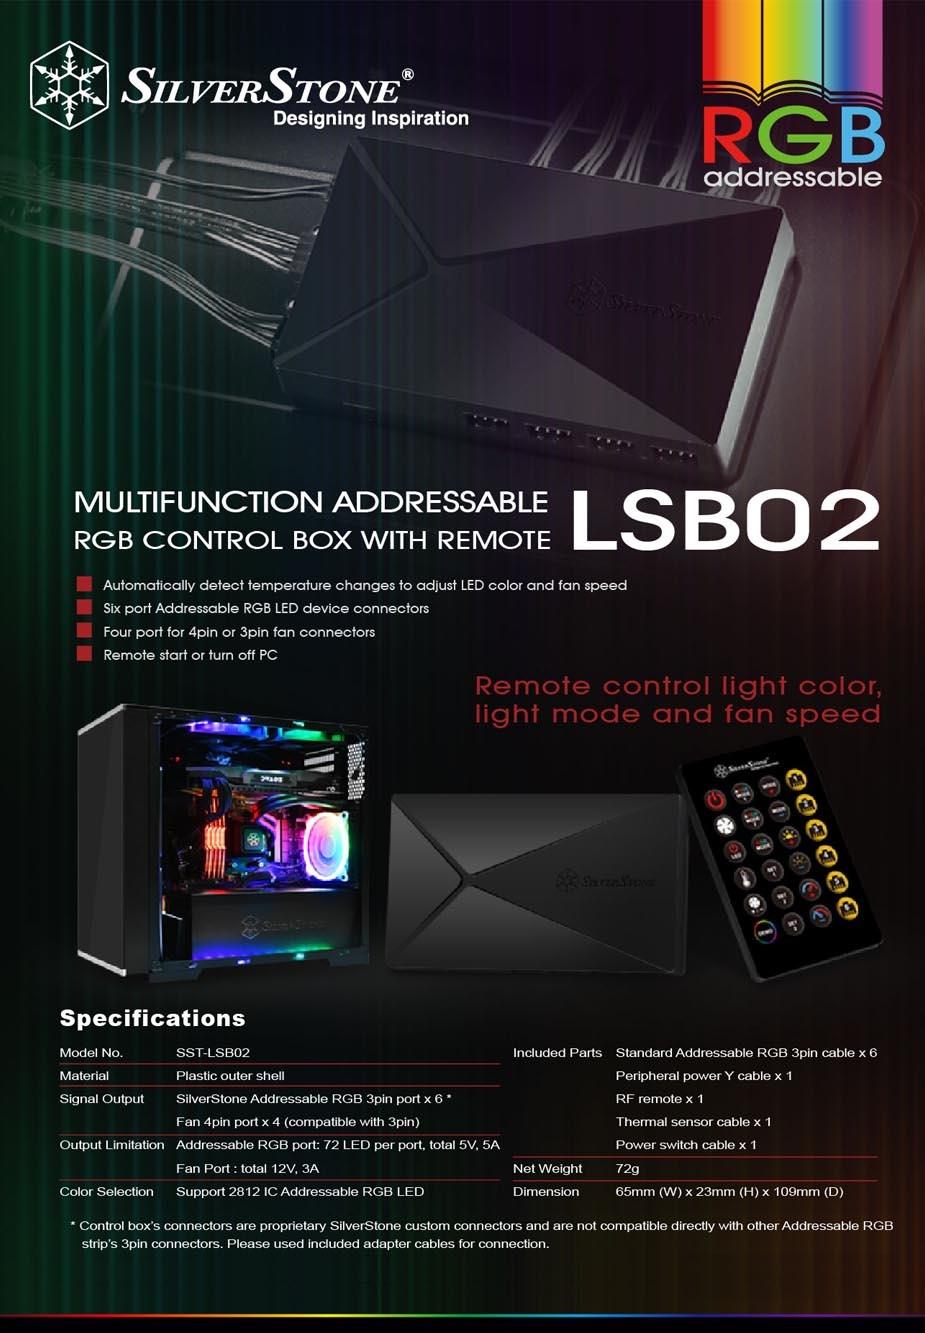 SilverStone LSB02 Addressable RGB Light Strip Control Box - Desktop Overview 1